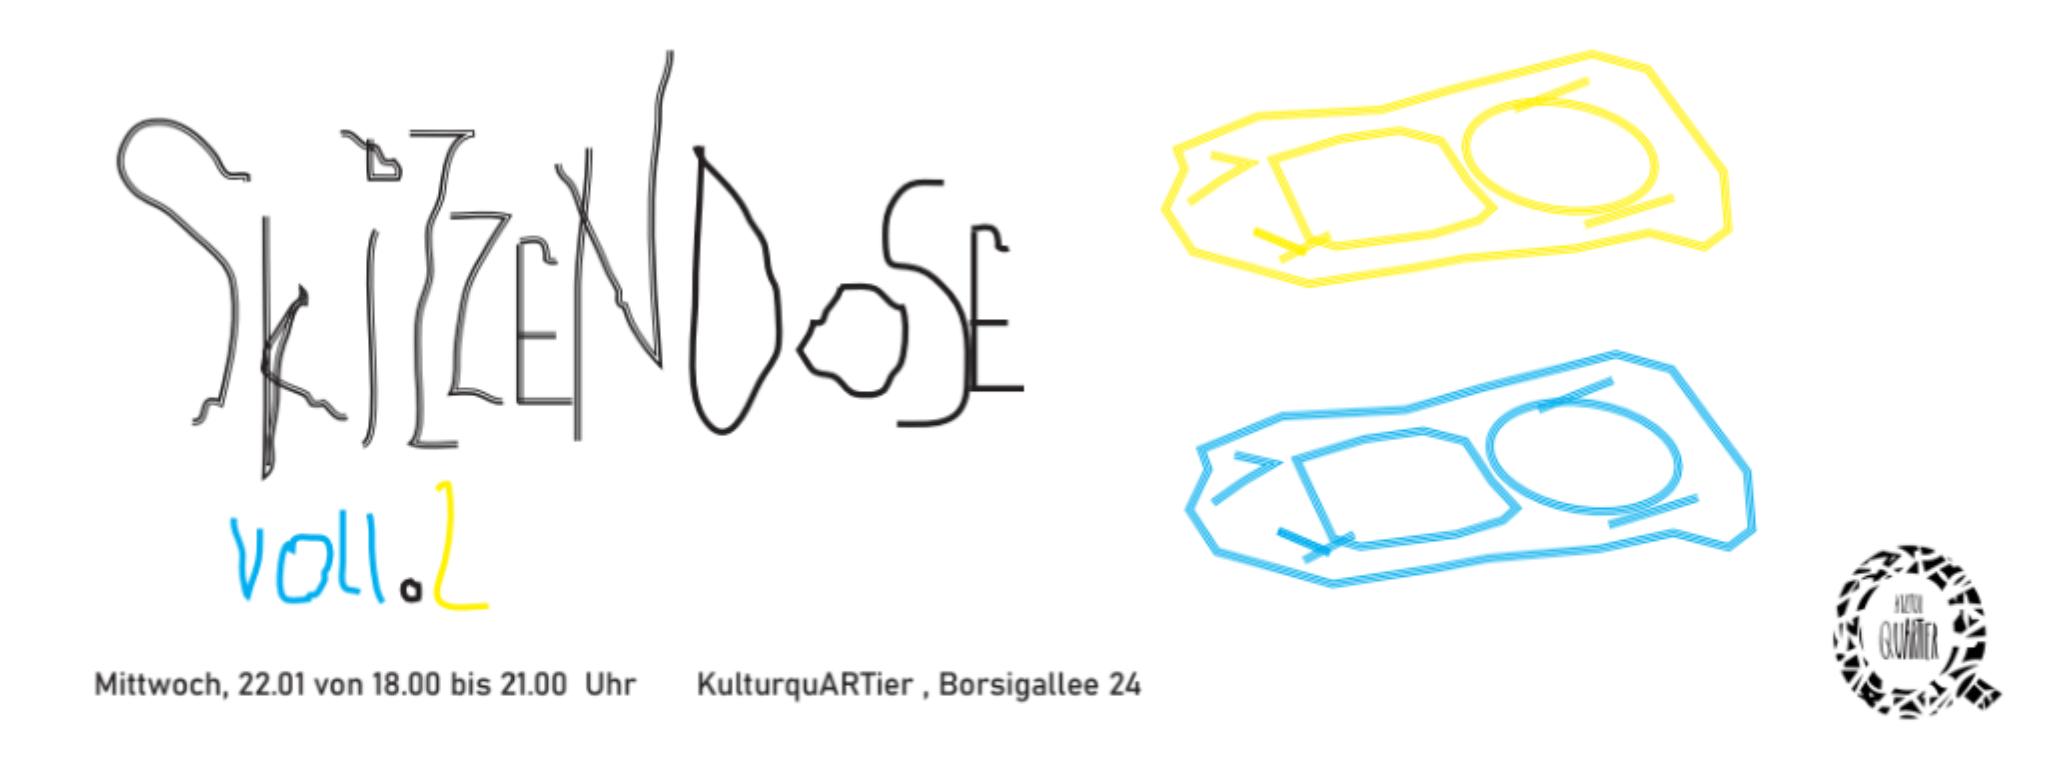 SkizzenDose voll.2